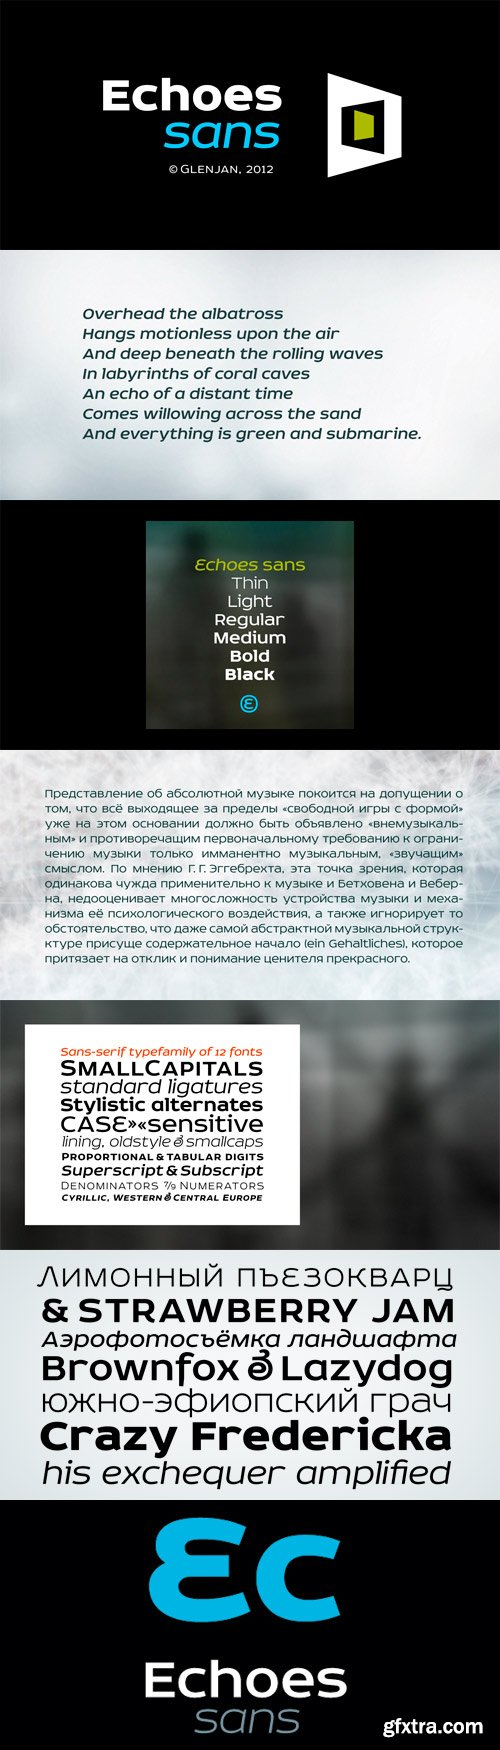 Echoes Sans Font Family - 12 Fonts for $300